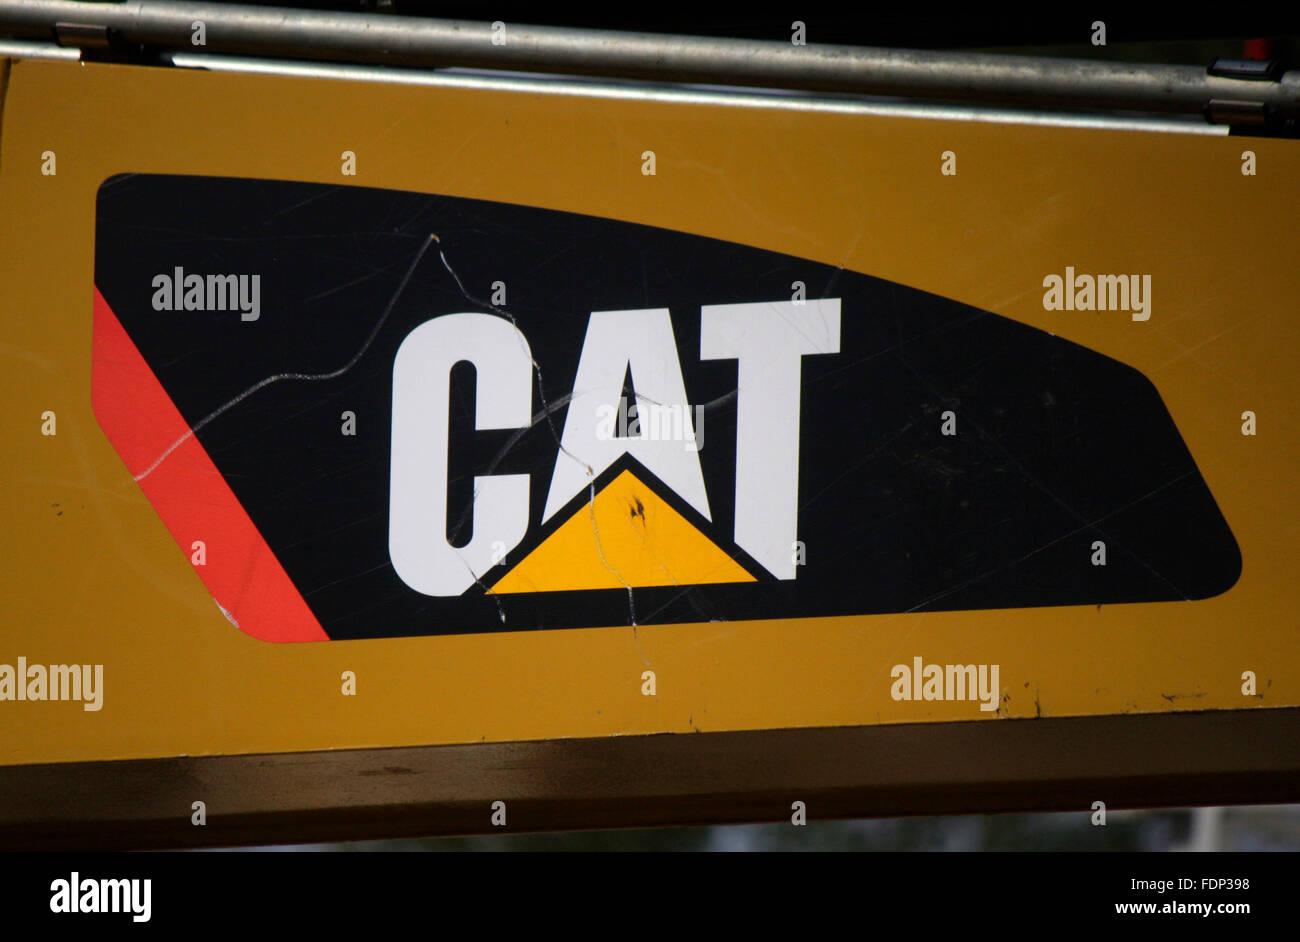 Markenname cat caterpillar berlin